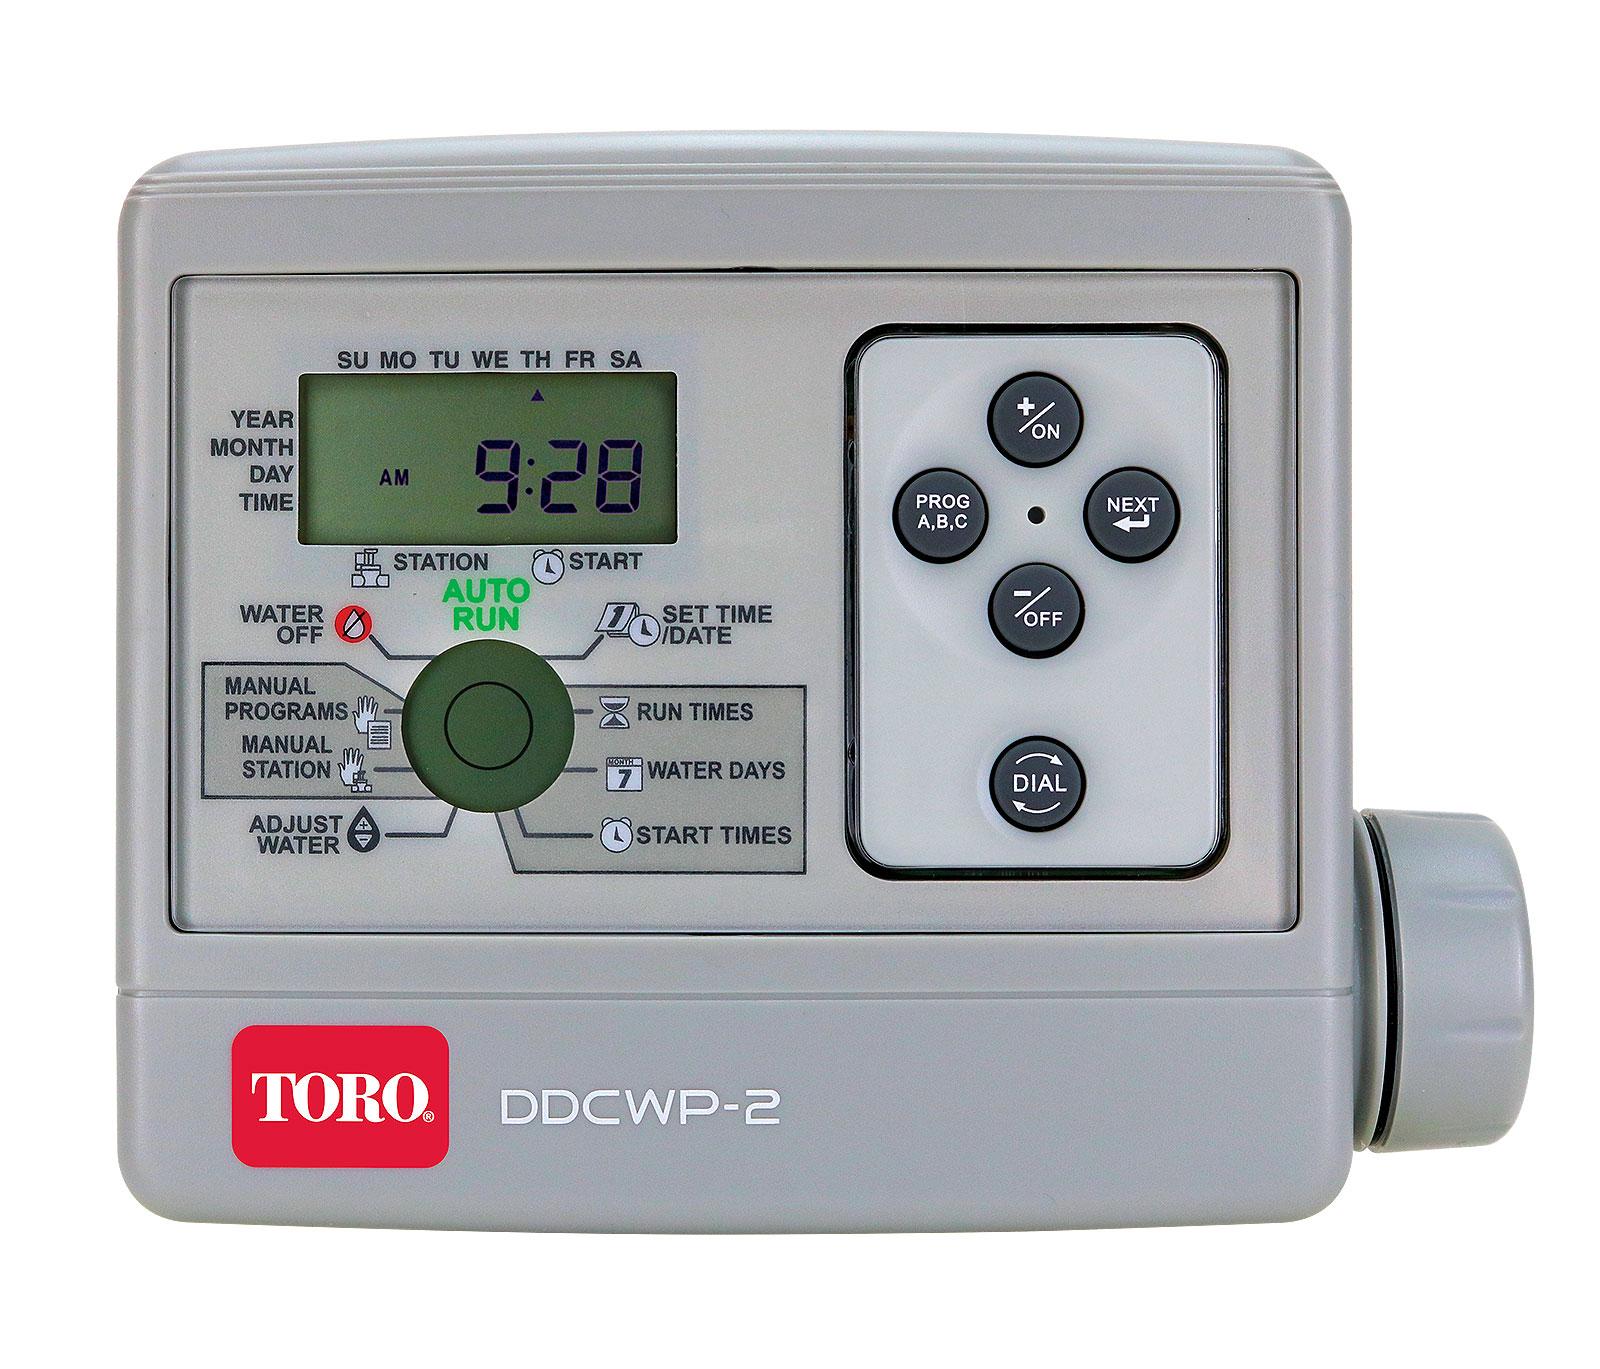 toro ddc wp rh toro com Toro Sprinkler System Home toro water sprinkler system manual